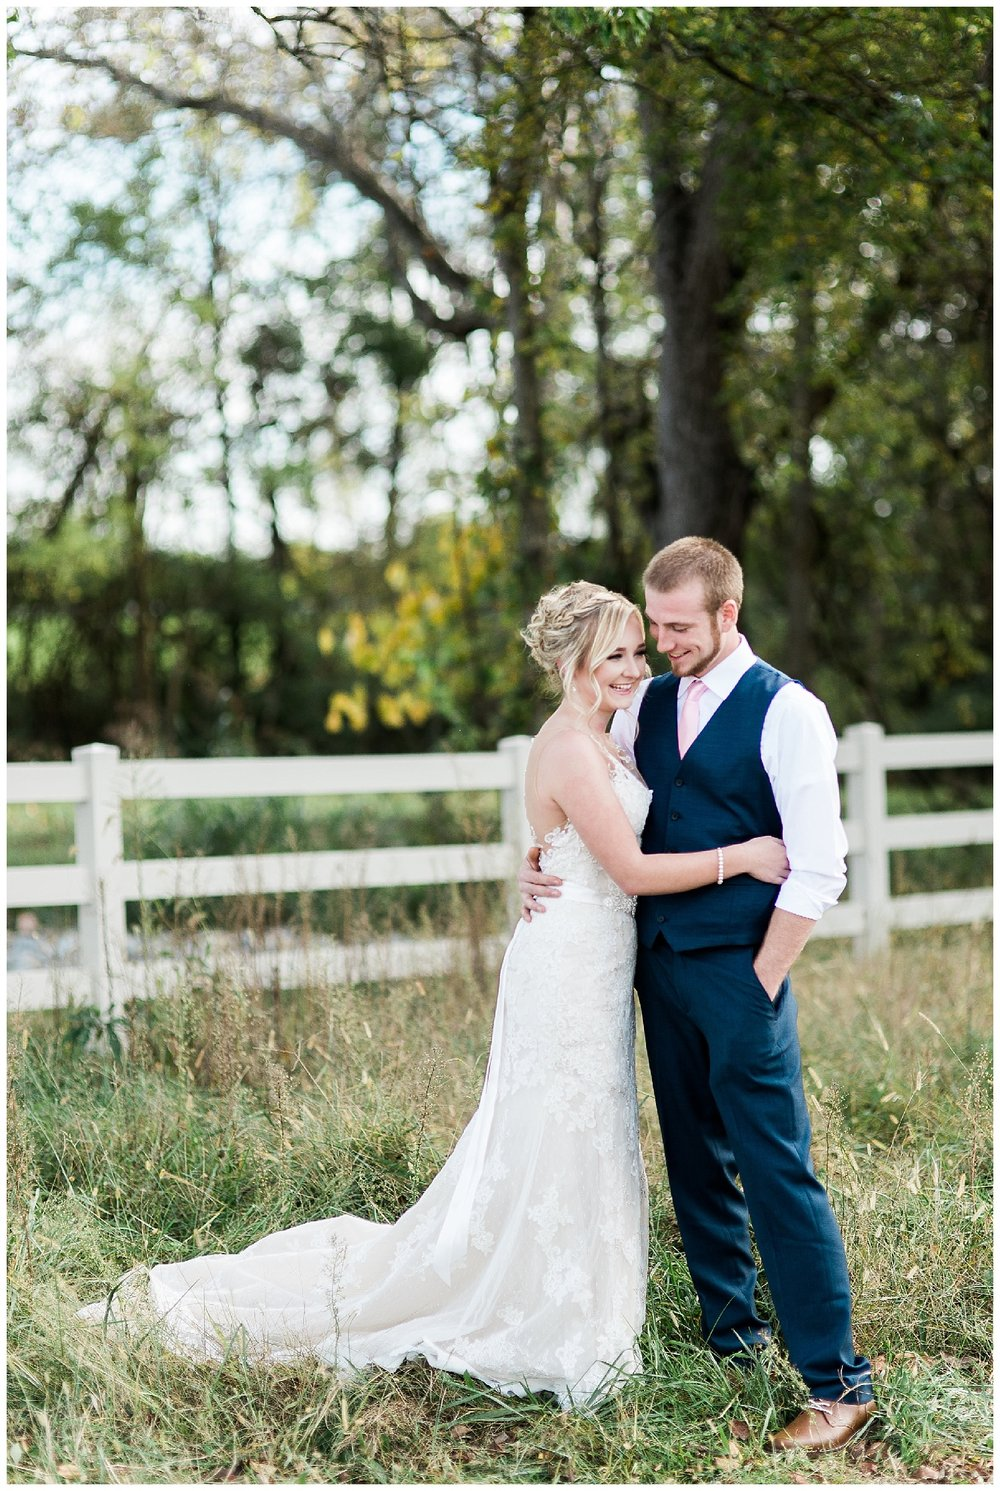 everleigh-photography-cincinnati-wedding-photographer-best-moments-of-2016-cincinnati-wedding-cincinnati-weddings-86